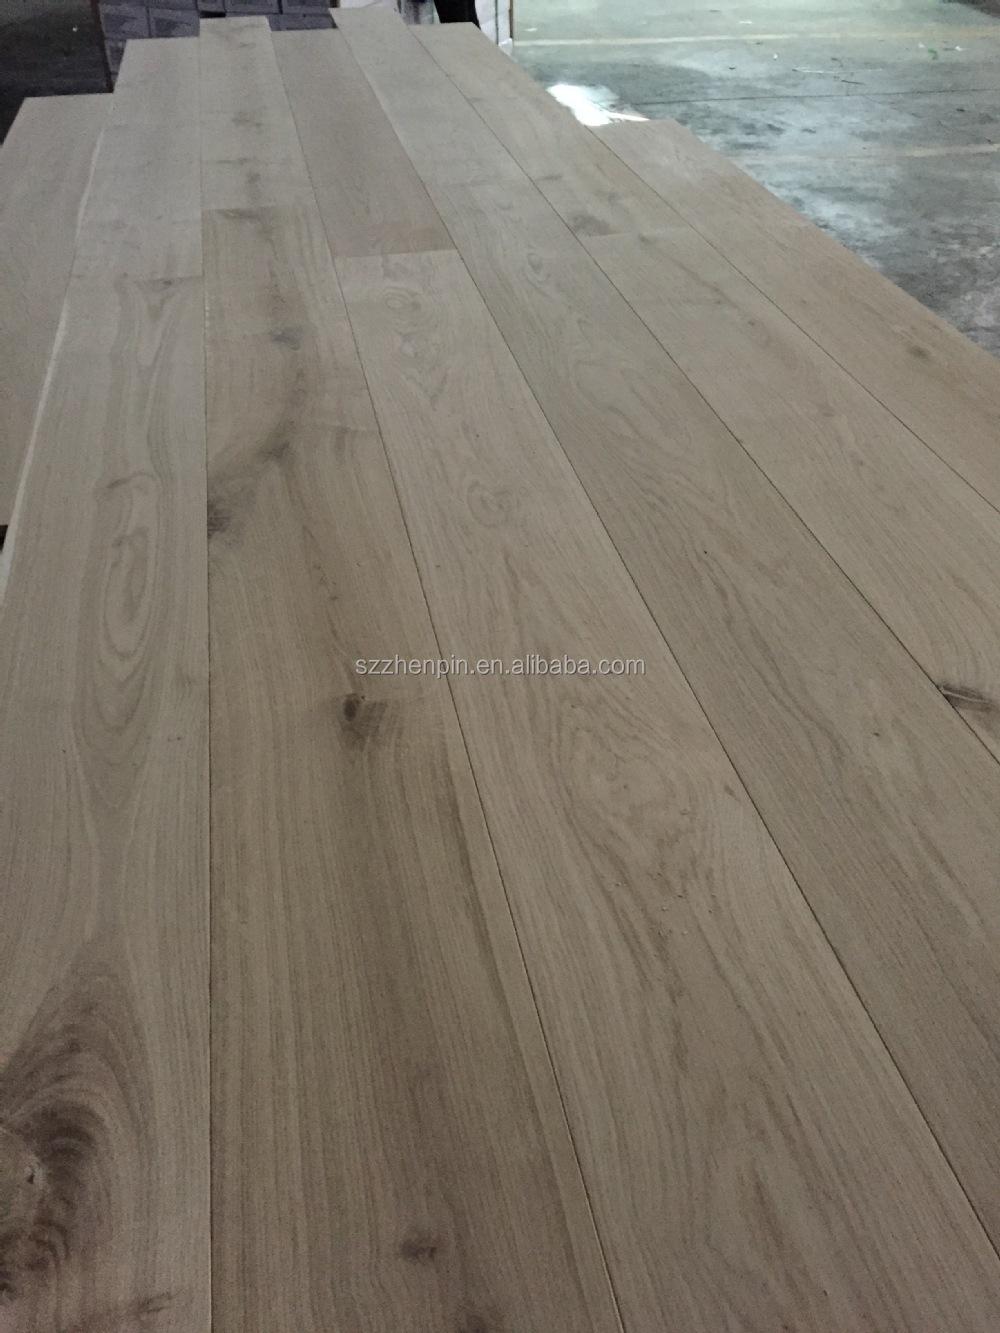 Multilayer European Engineered Oak Flooring 1900*190*18/6mm Unfinished  White Oak Woodflooring